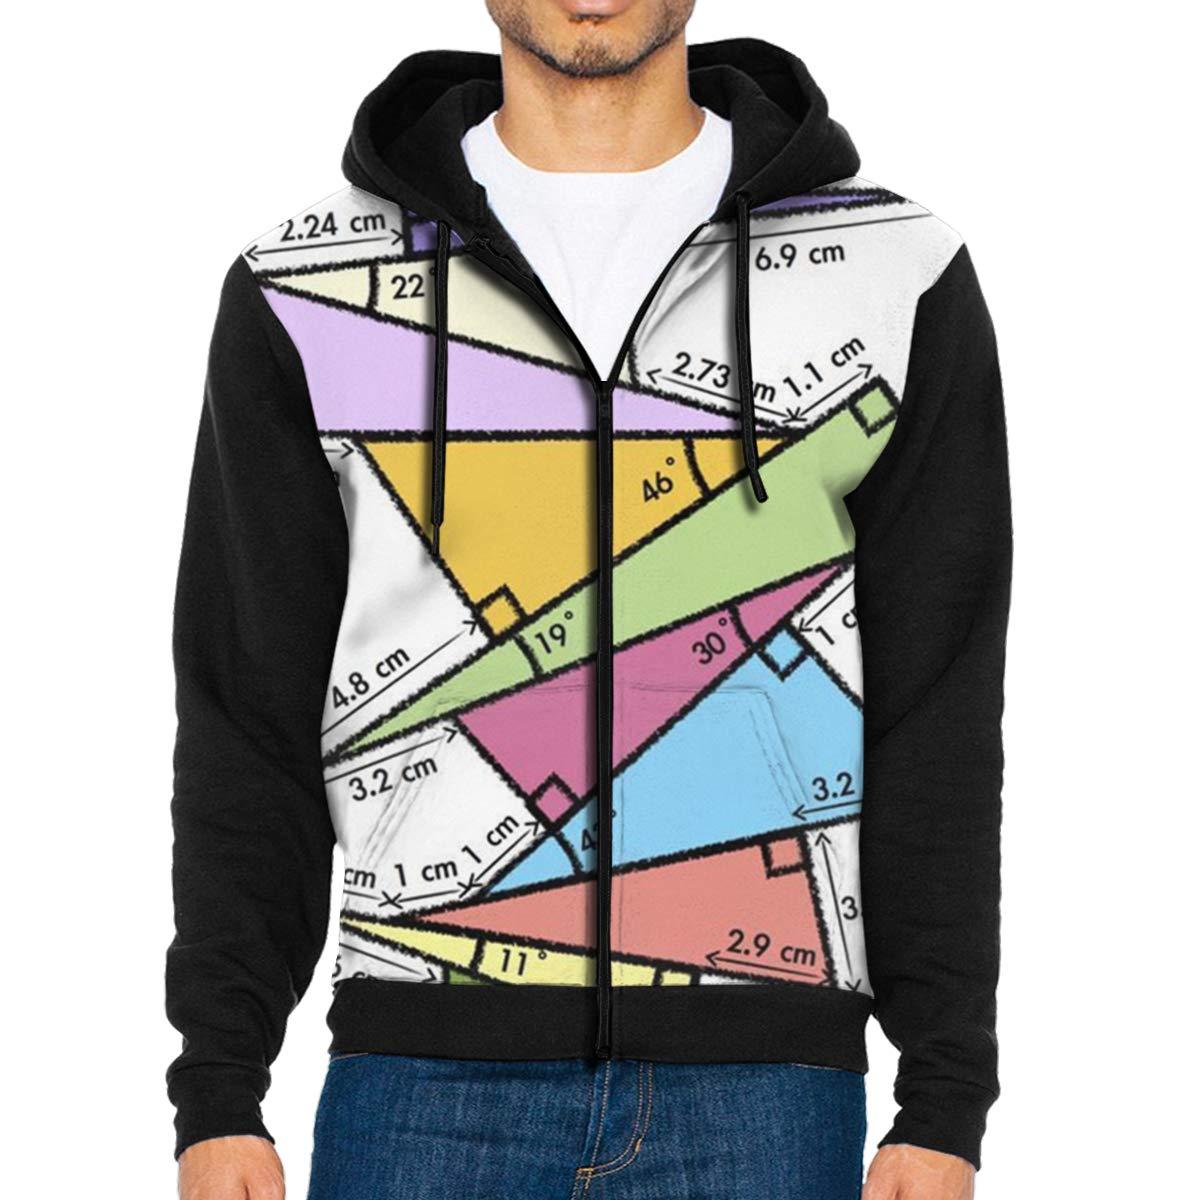 LFCLOSET Trigonometry Pile Up Lightweight Mans Jacket with Hood Long Sleeved Zippered Outwear